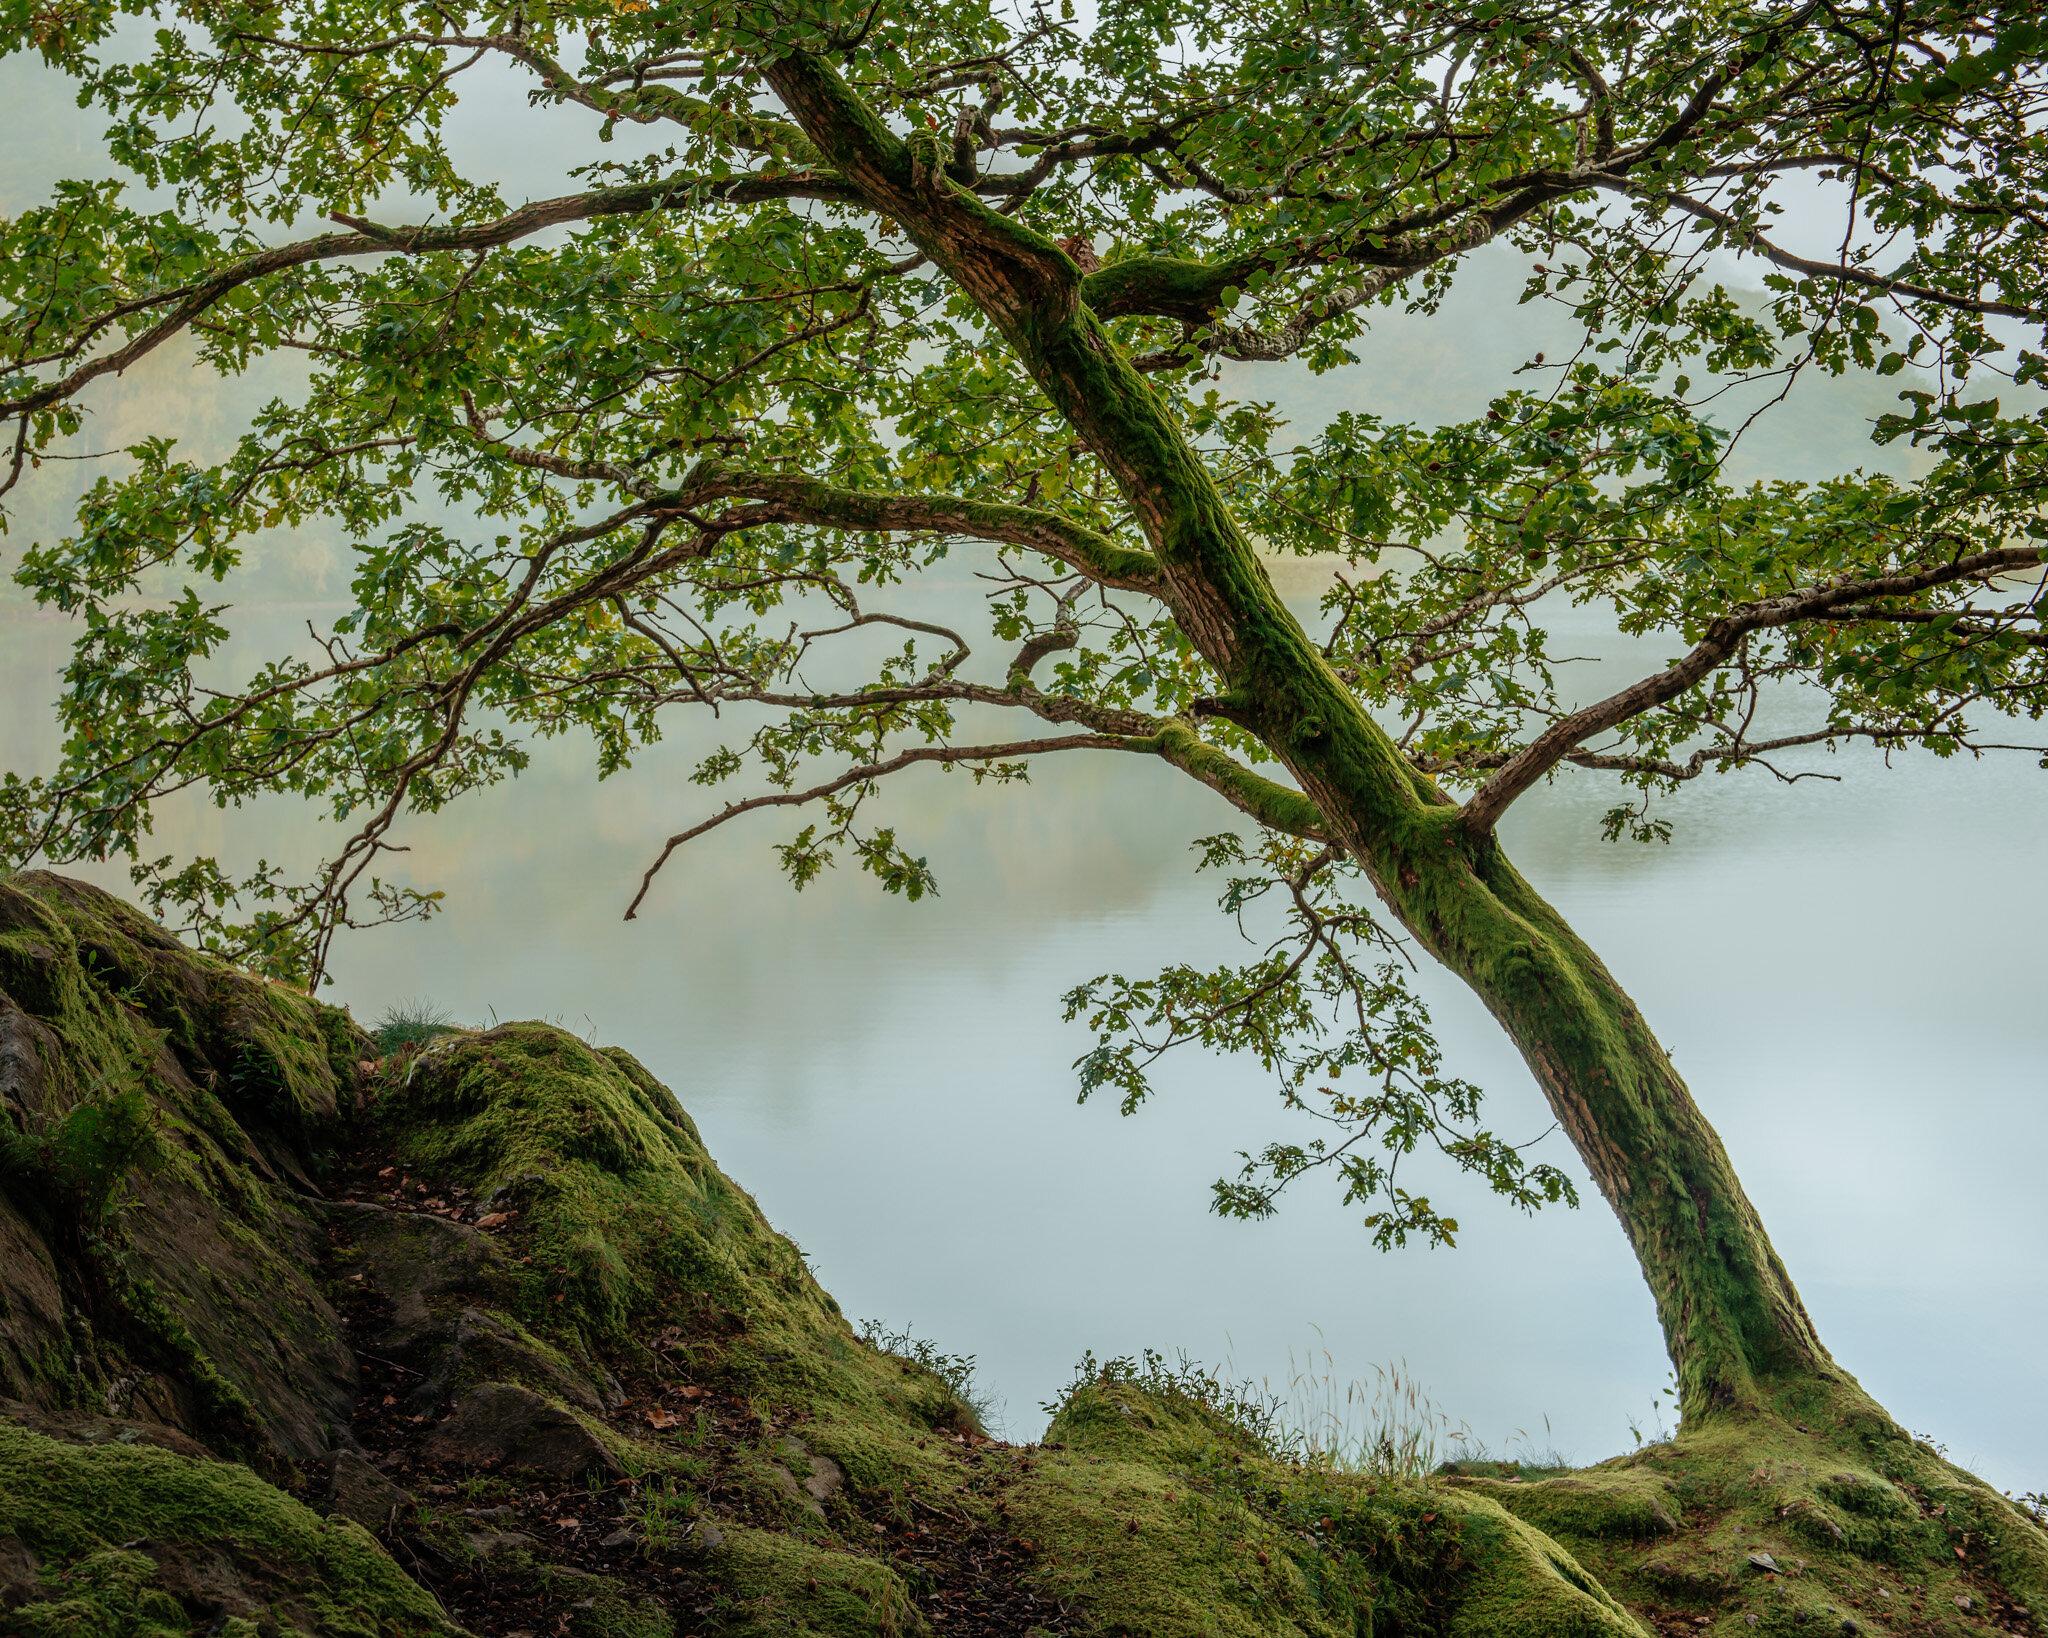 Penny Rock Woods, Grasmere